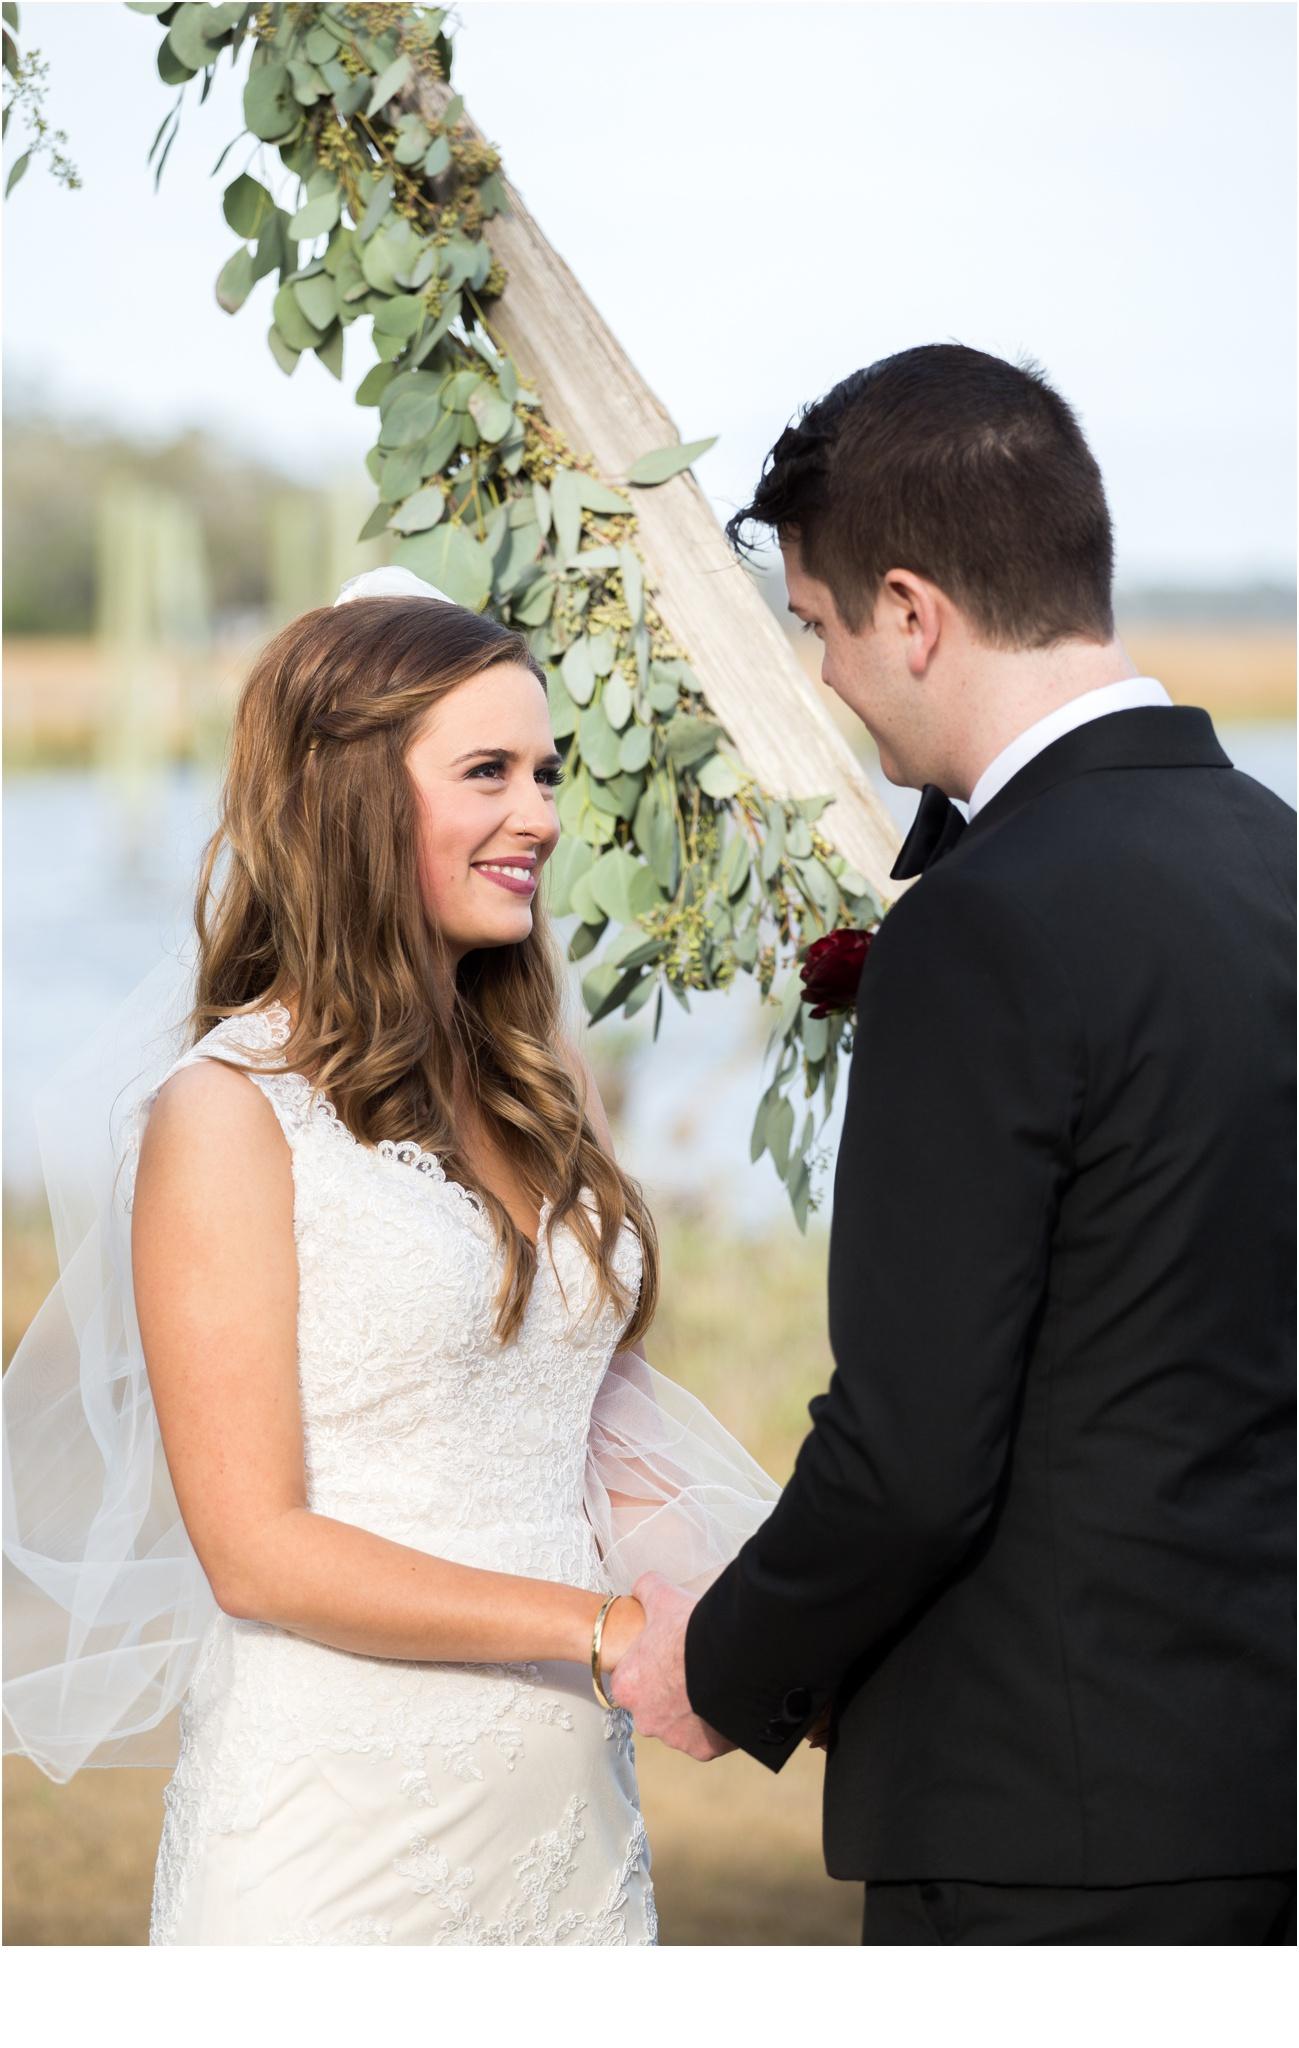 Rainey_Gregg_Photography_St._Simons_Island_Georgia_California_Wedding_Portrait_Photography_0816.jpg